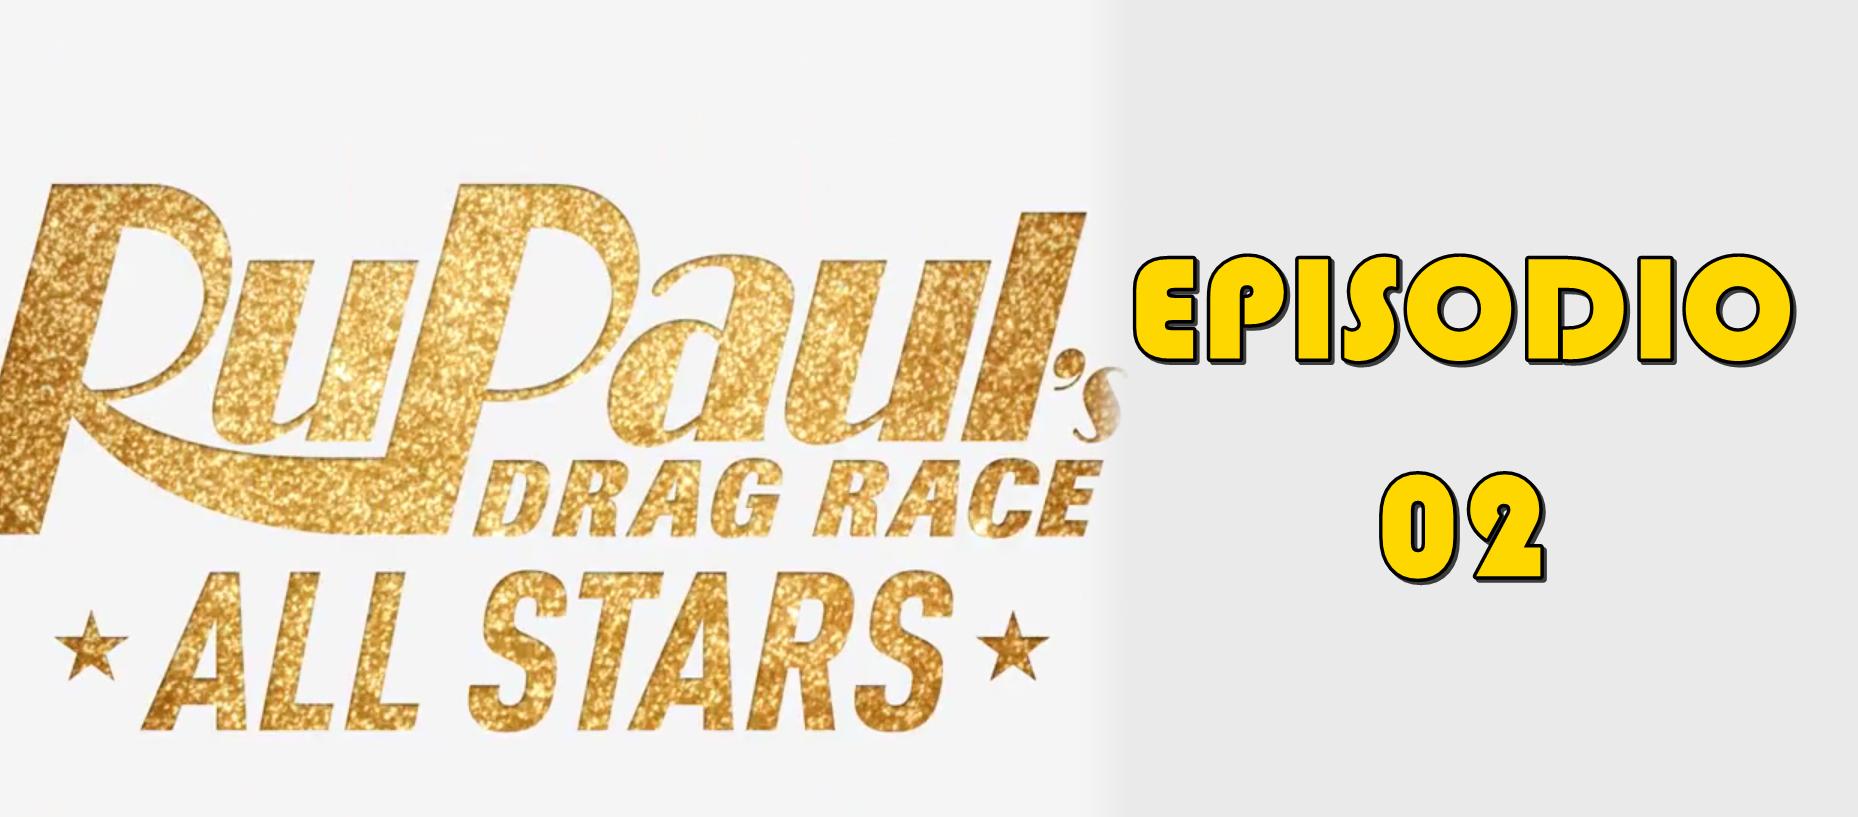 Rupaul´s Drag Race All Stars 3 Episodio 02